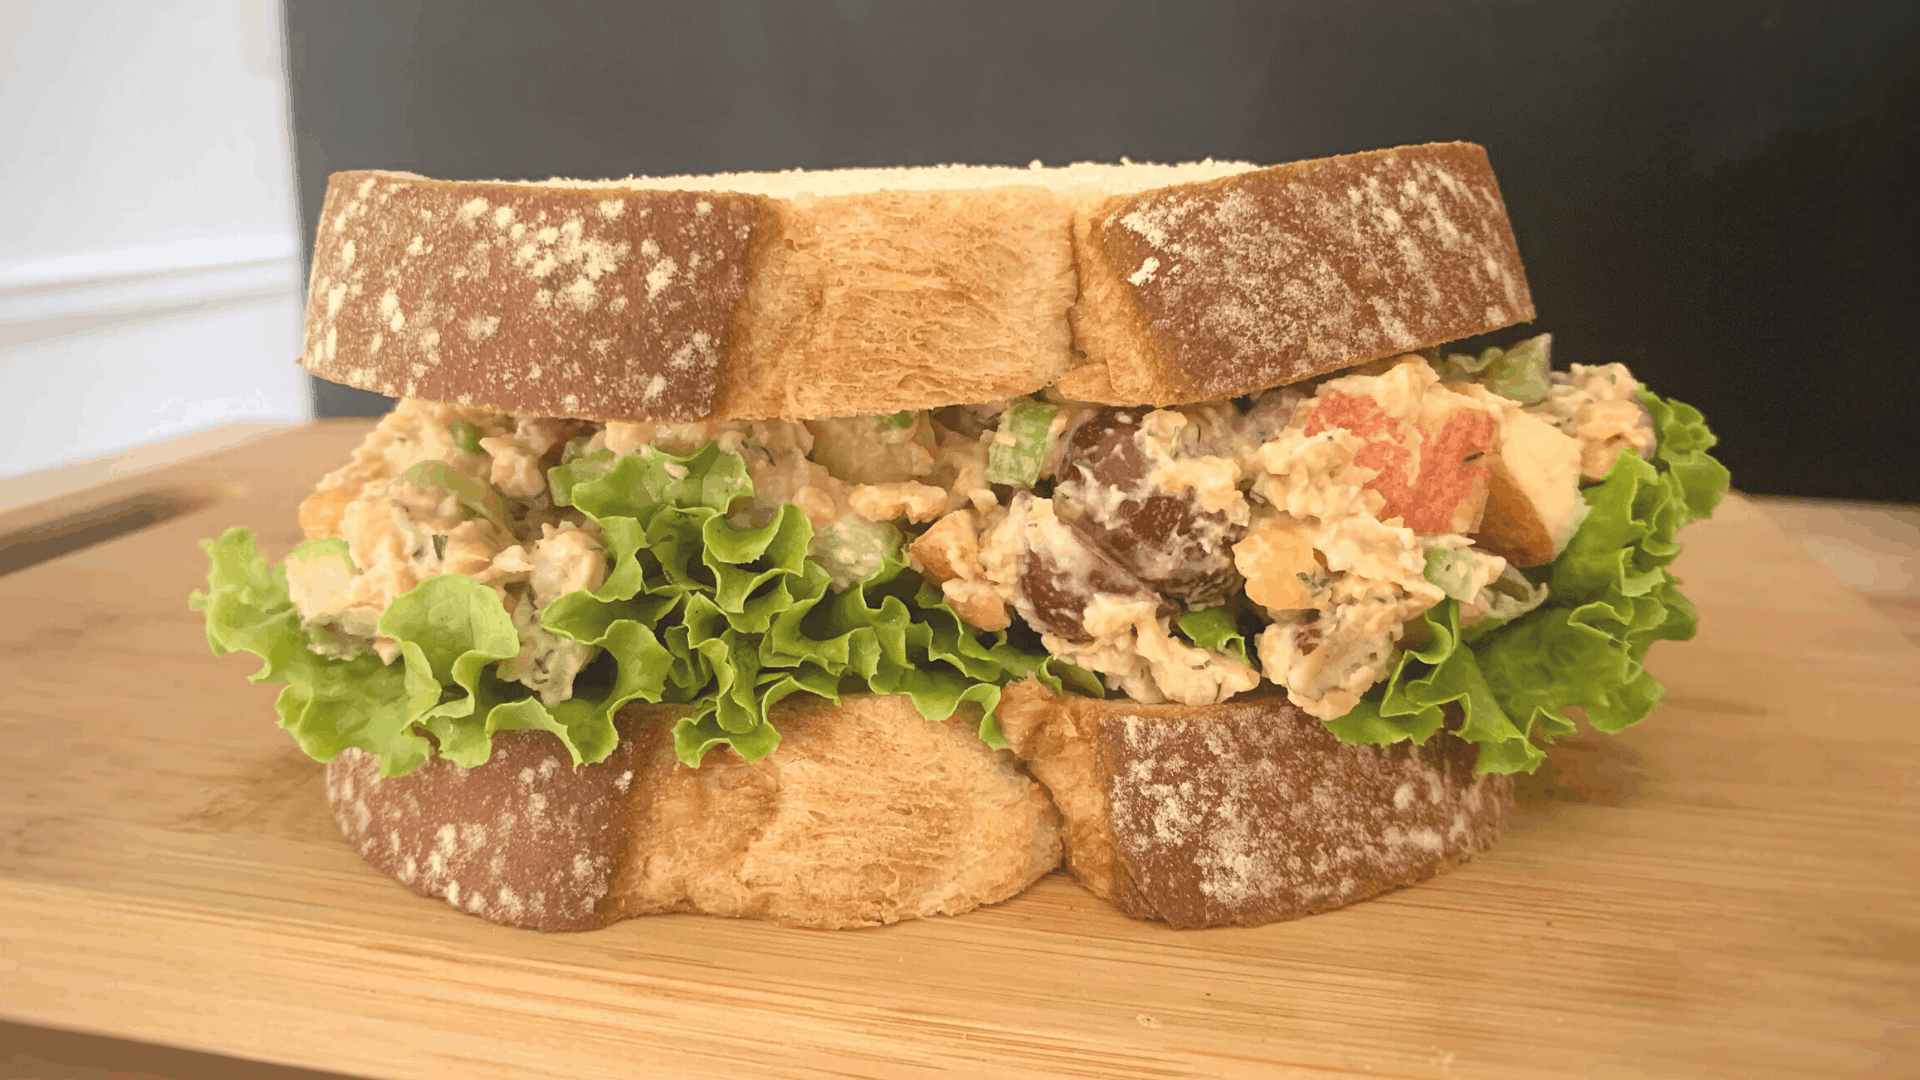 Arbys Copycat Vegan Chicken-Less Pecan Chickpea Salad